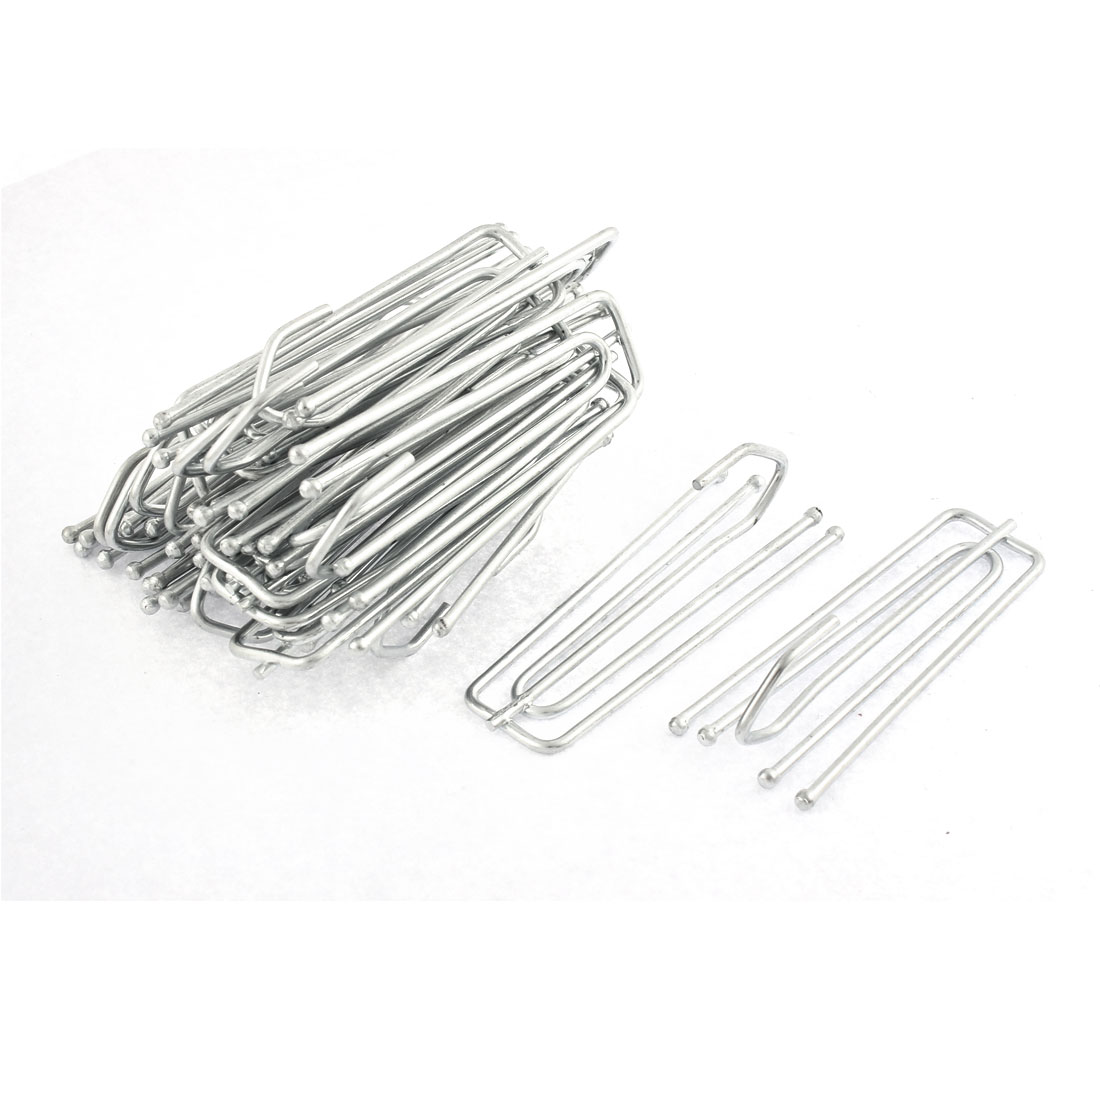 Metal 4 Prongs Pinch Pleat Drapes Curtain Hooks 7cm x 2.4cm 20Pcs